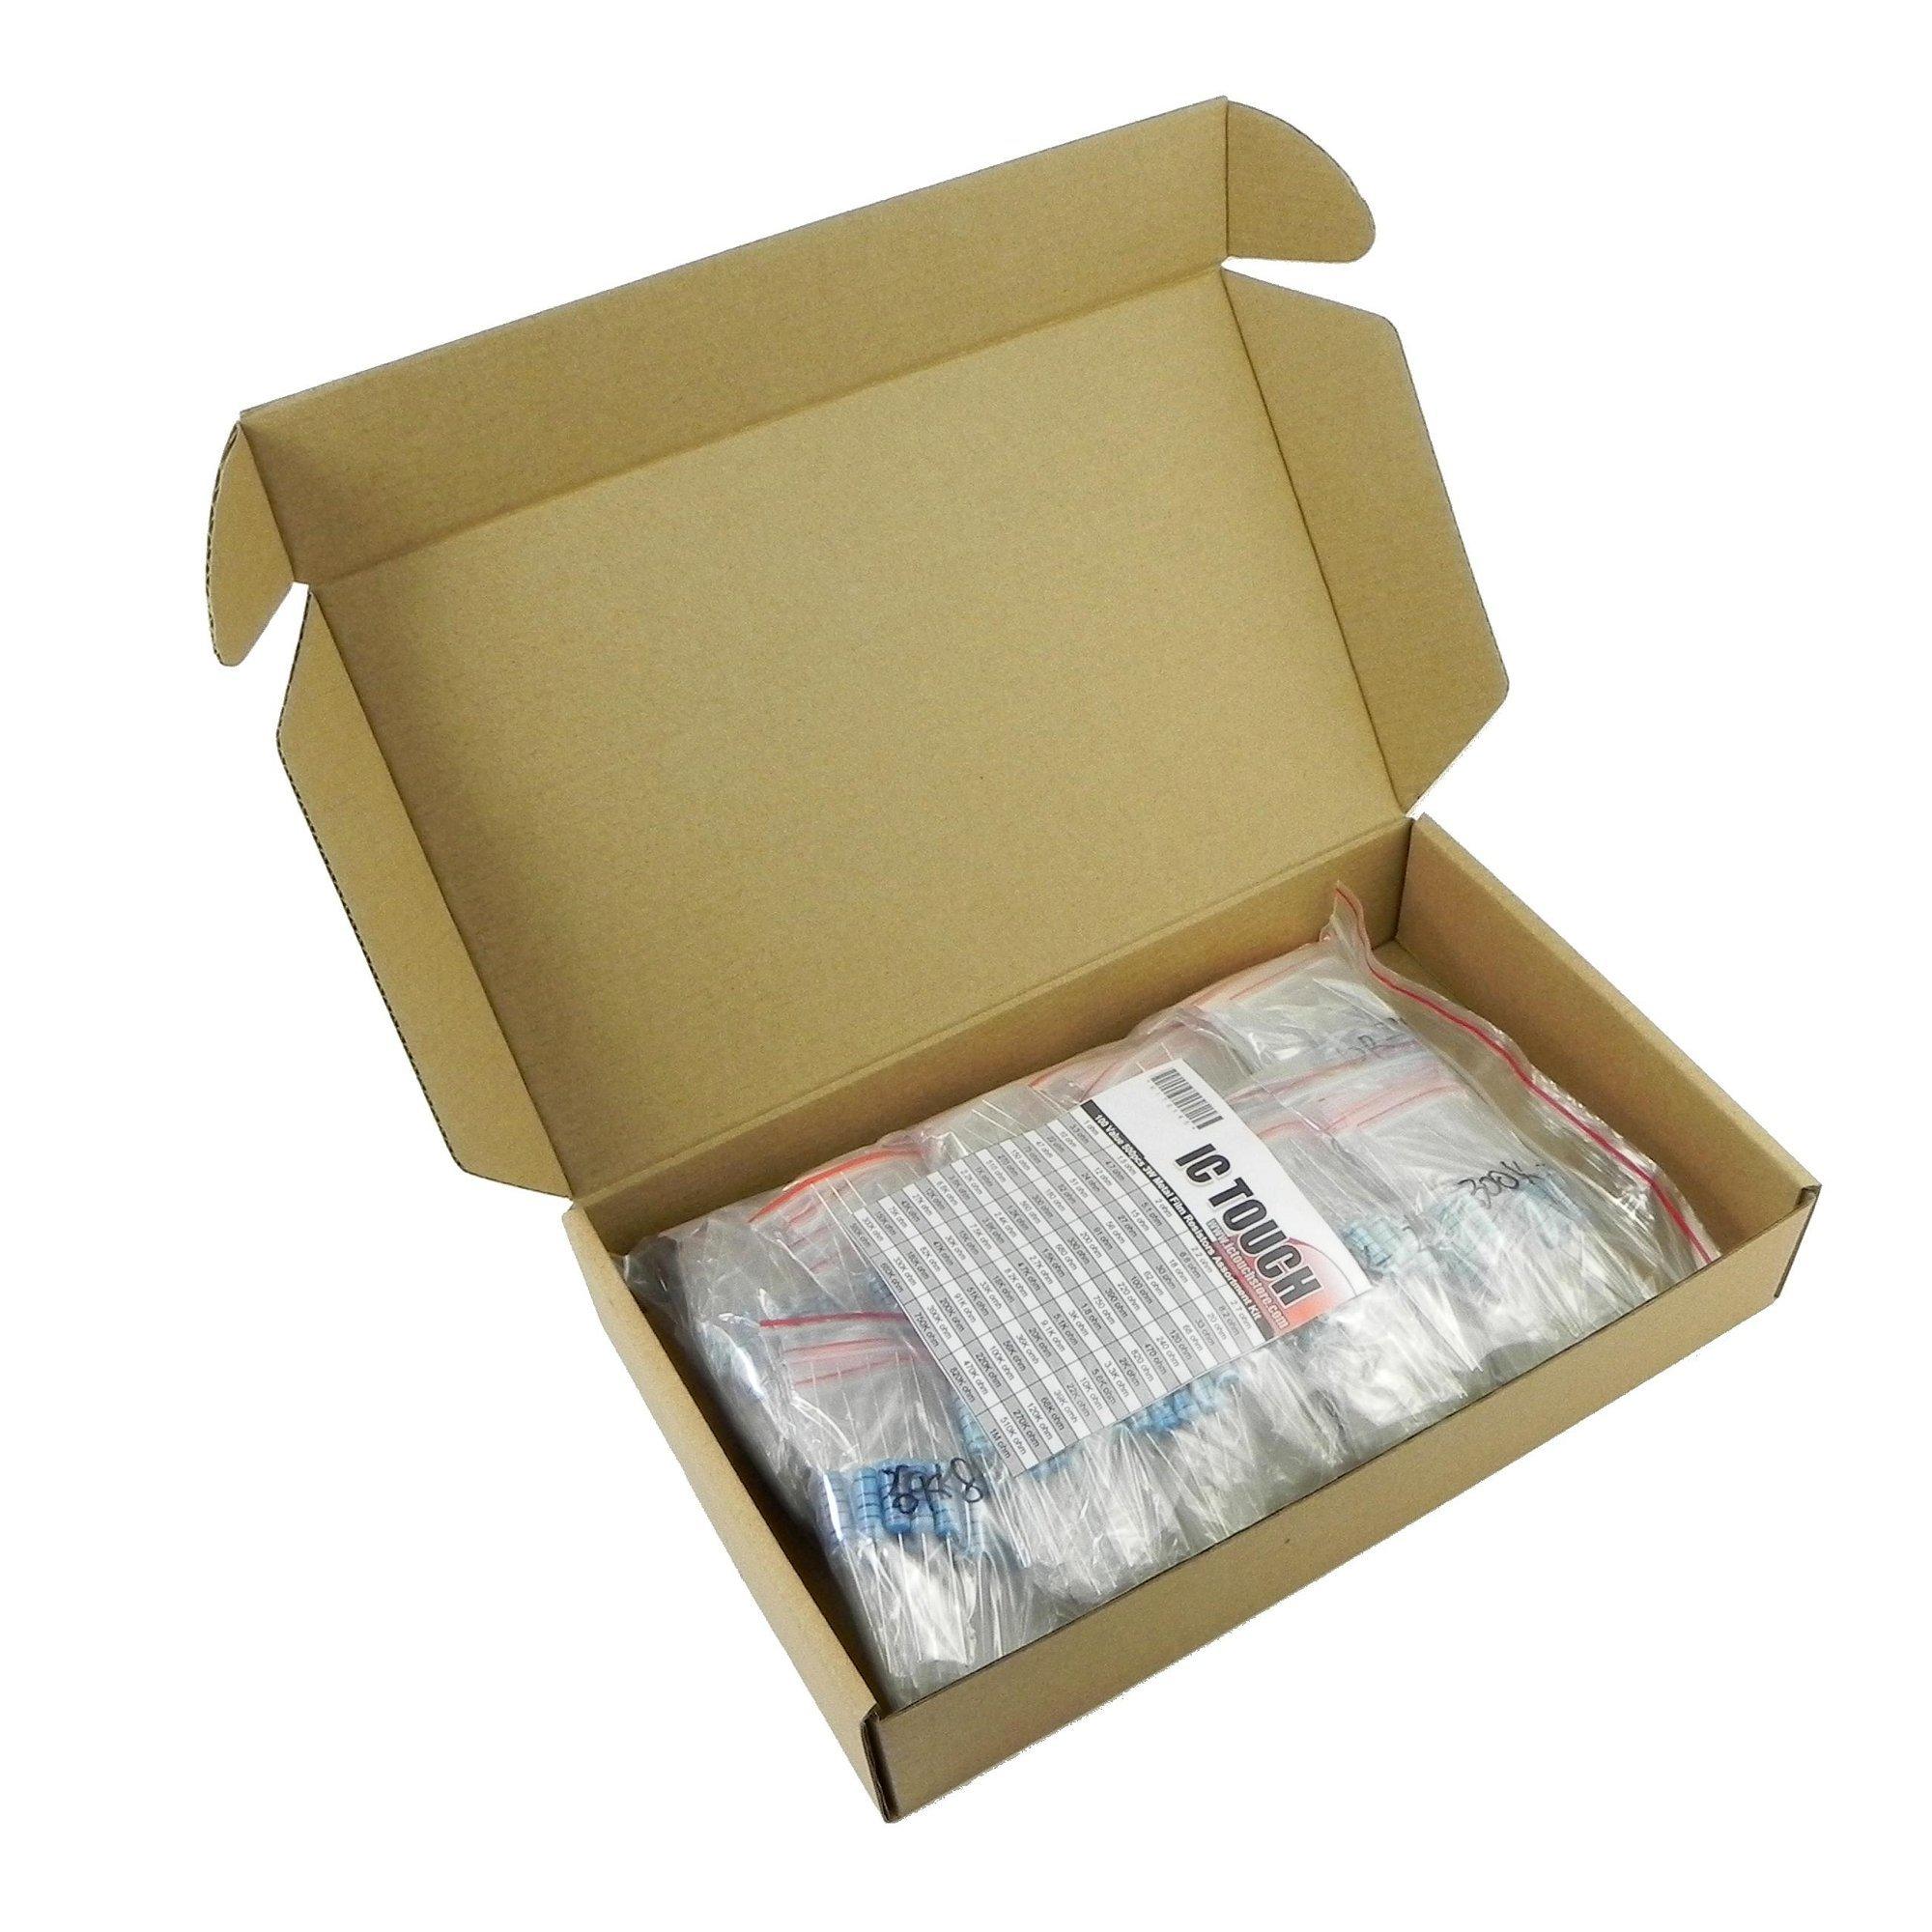 Ictouch 100value 500pcs 3W Metal Film Resistor +/-1% Assortment Kit KIT0145